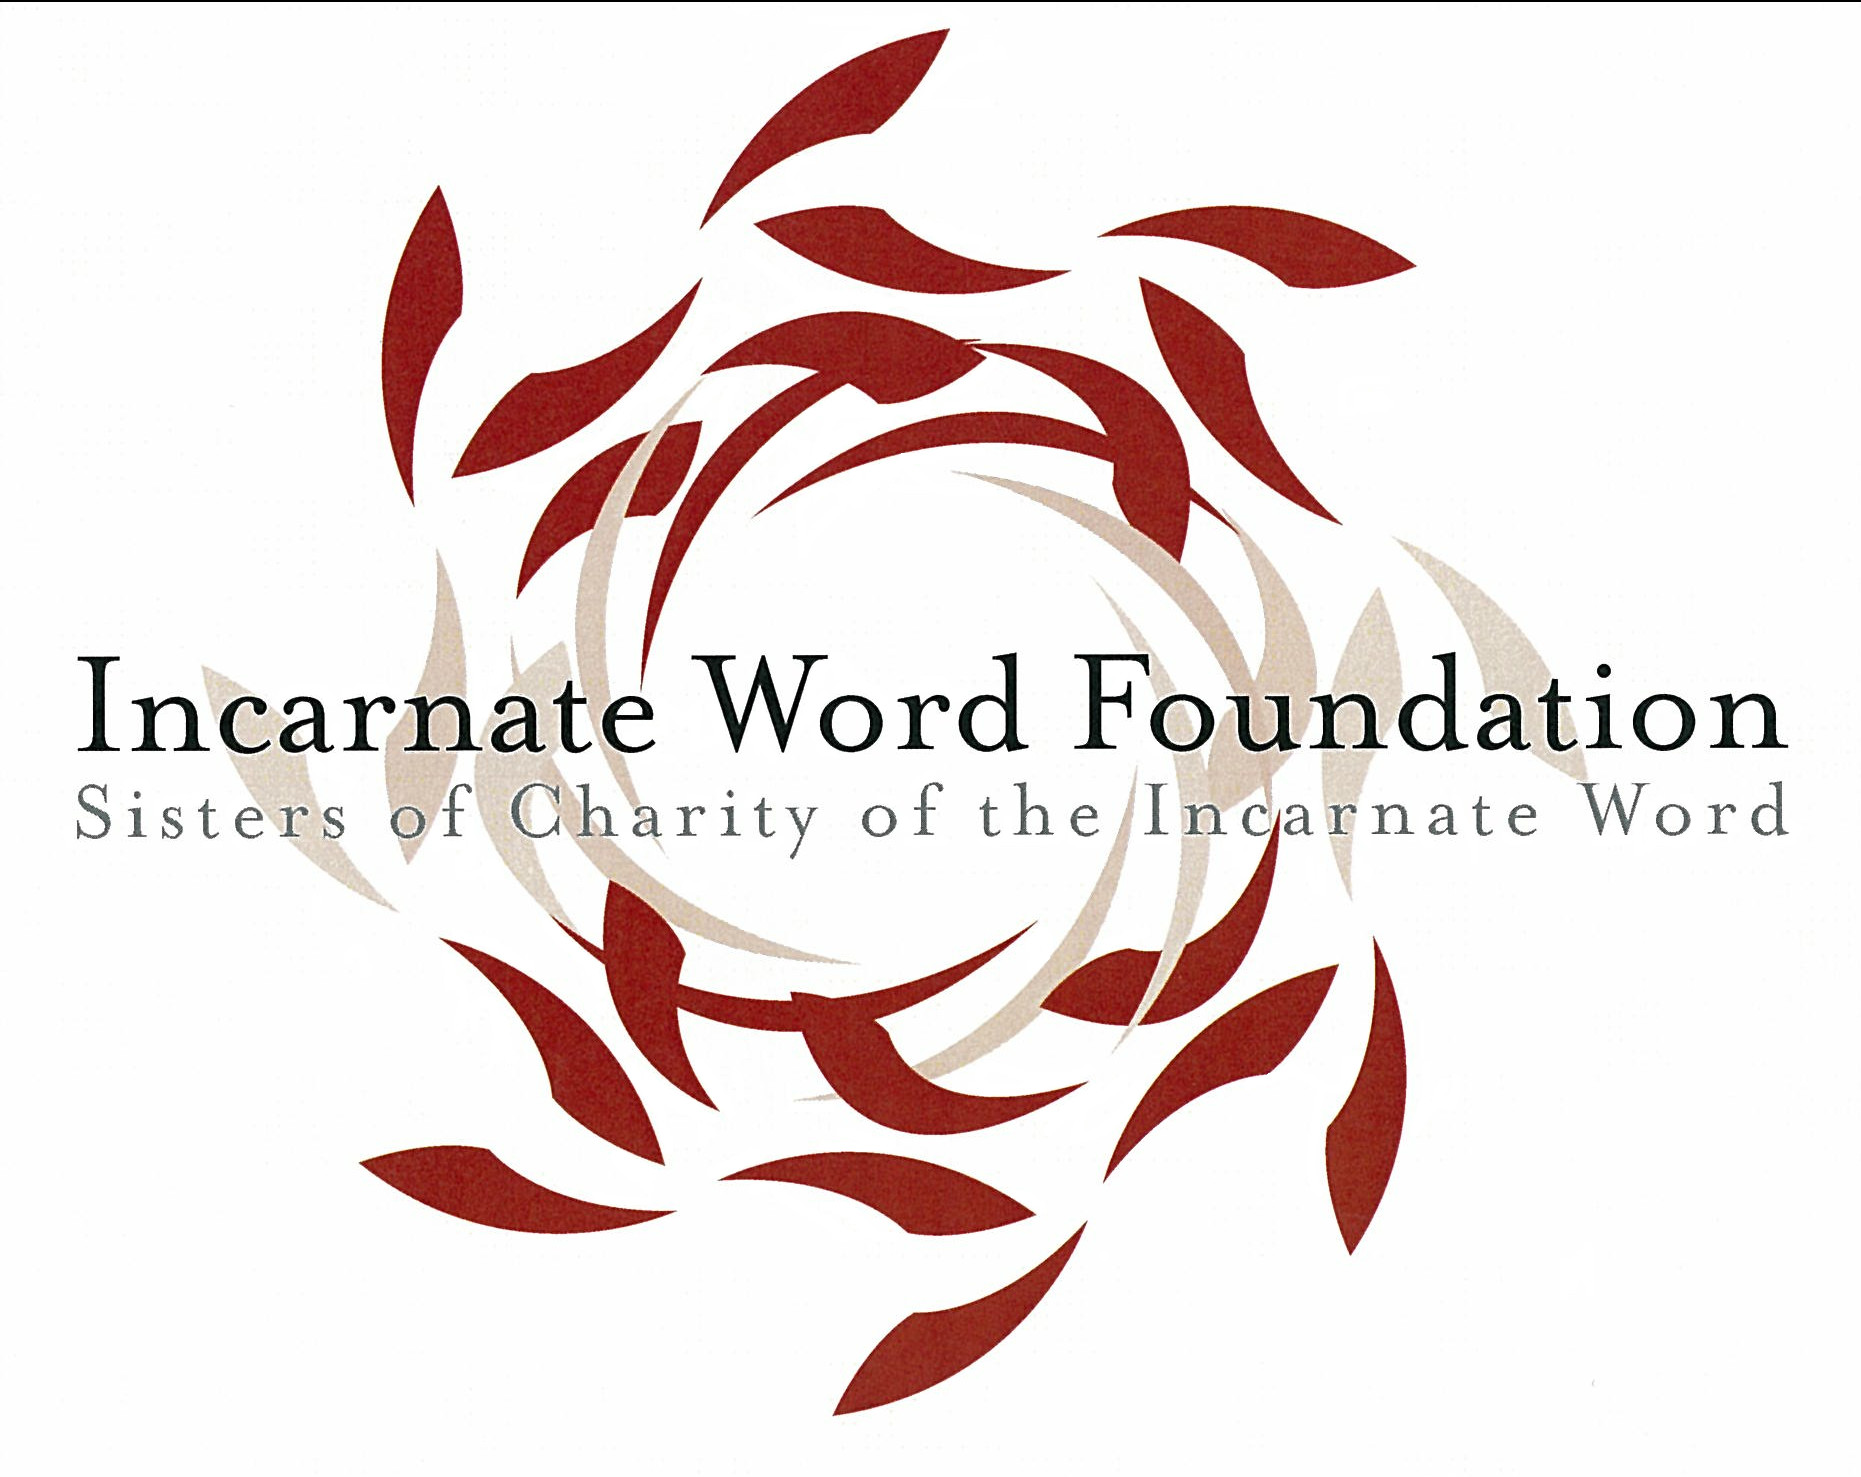 Incarnate Word Foundation